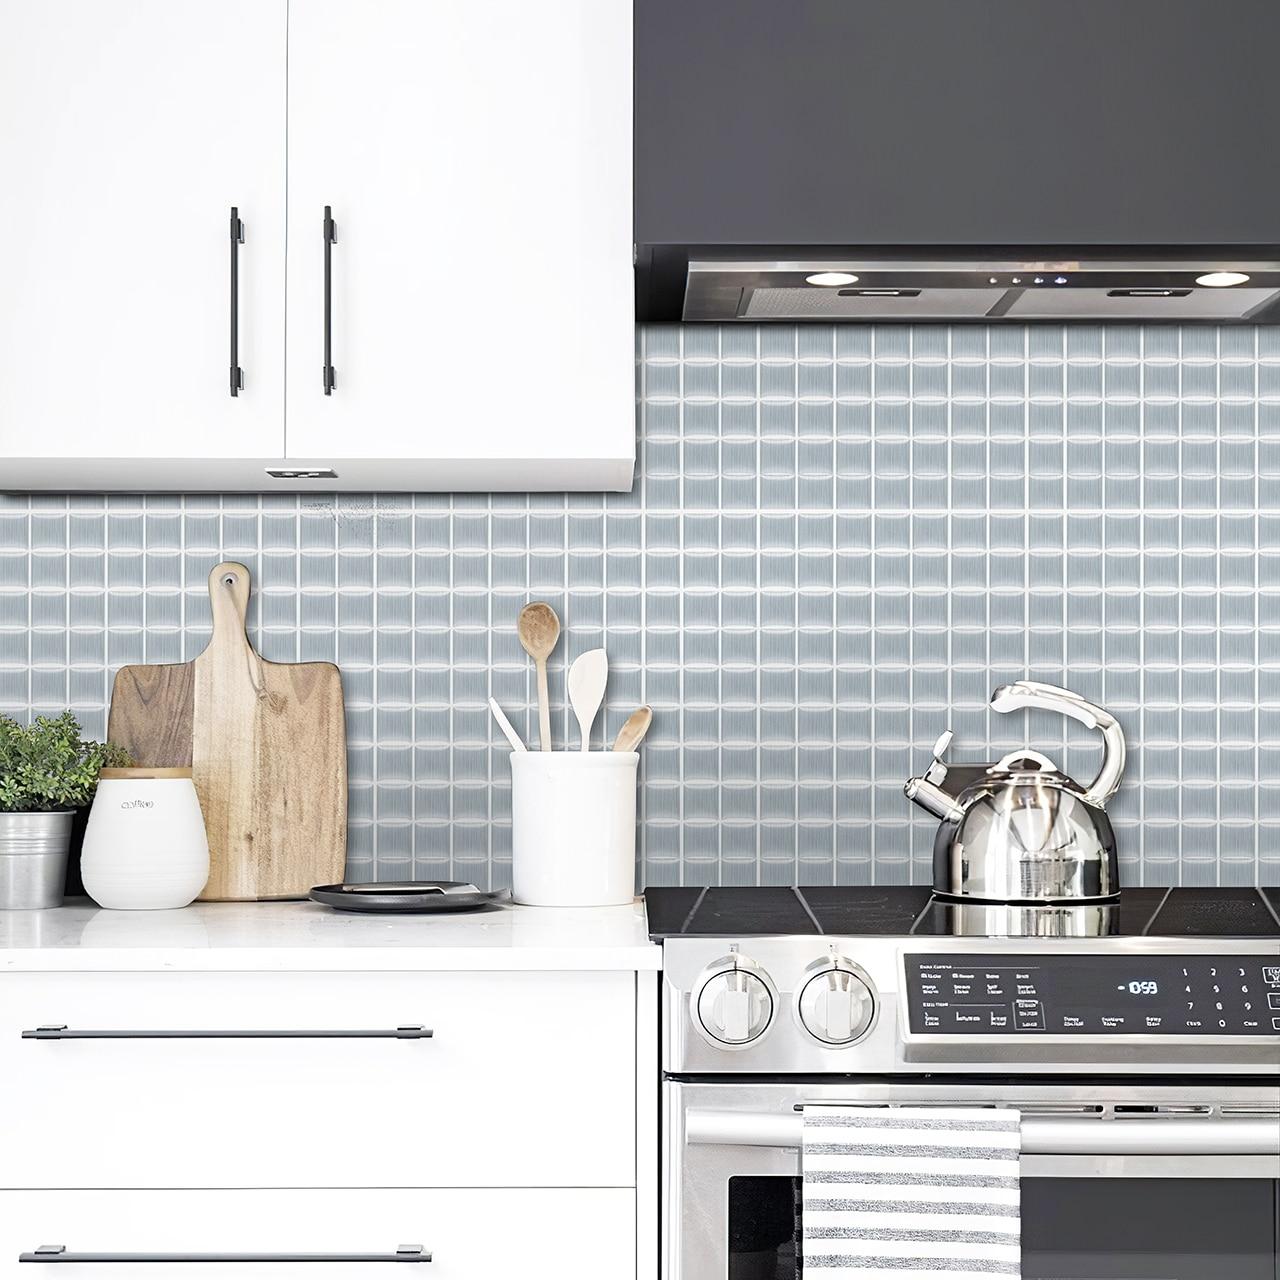 Large 3d Waterproof Self Adhesive Wallpaper Stickers Peel And Stick Backsplash Tiles Kitchen Bathroom Mosaic Vinyl Wallcoverings Wall Stickers Aliexpress